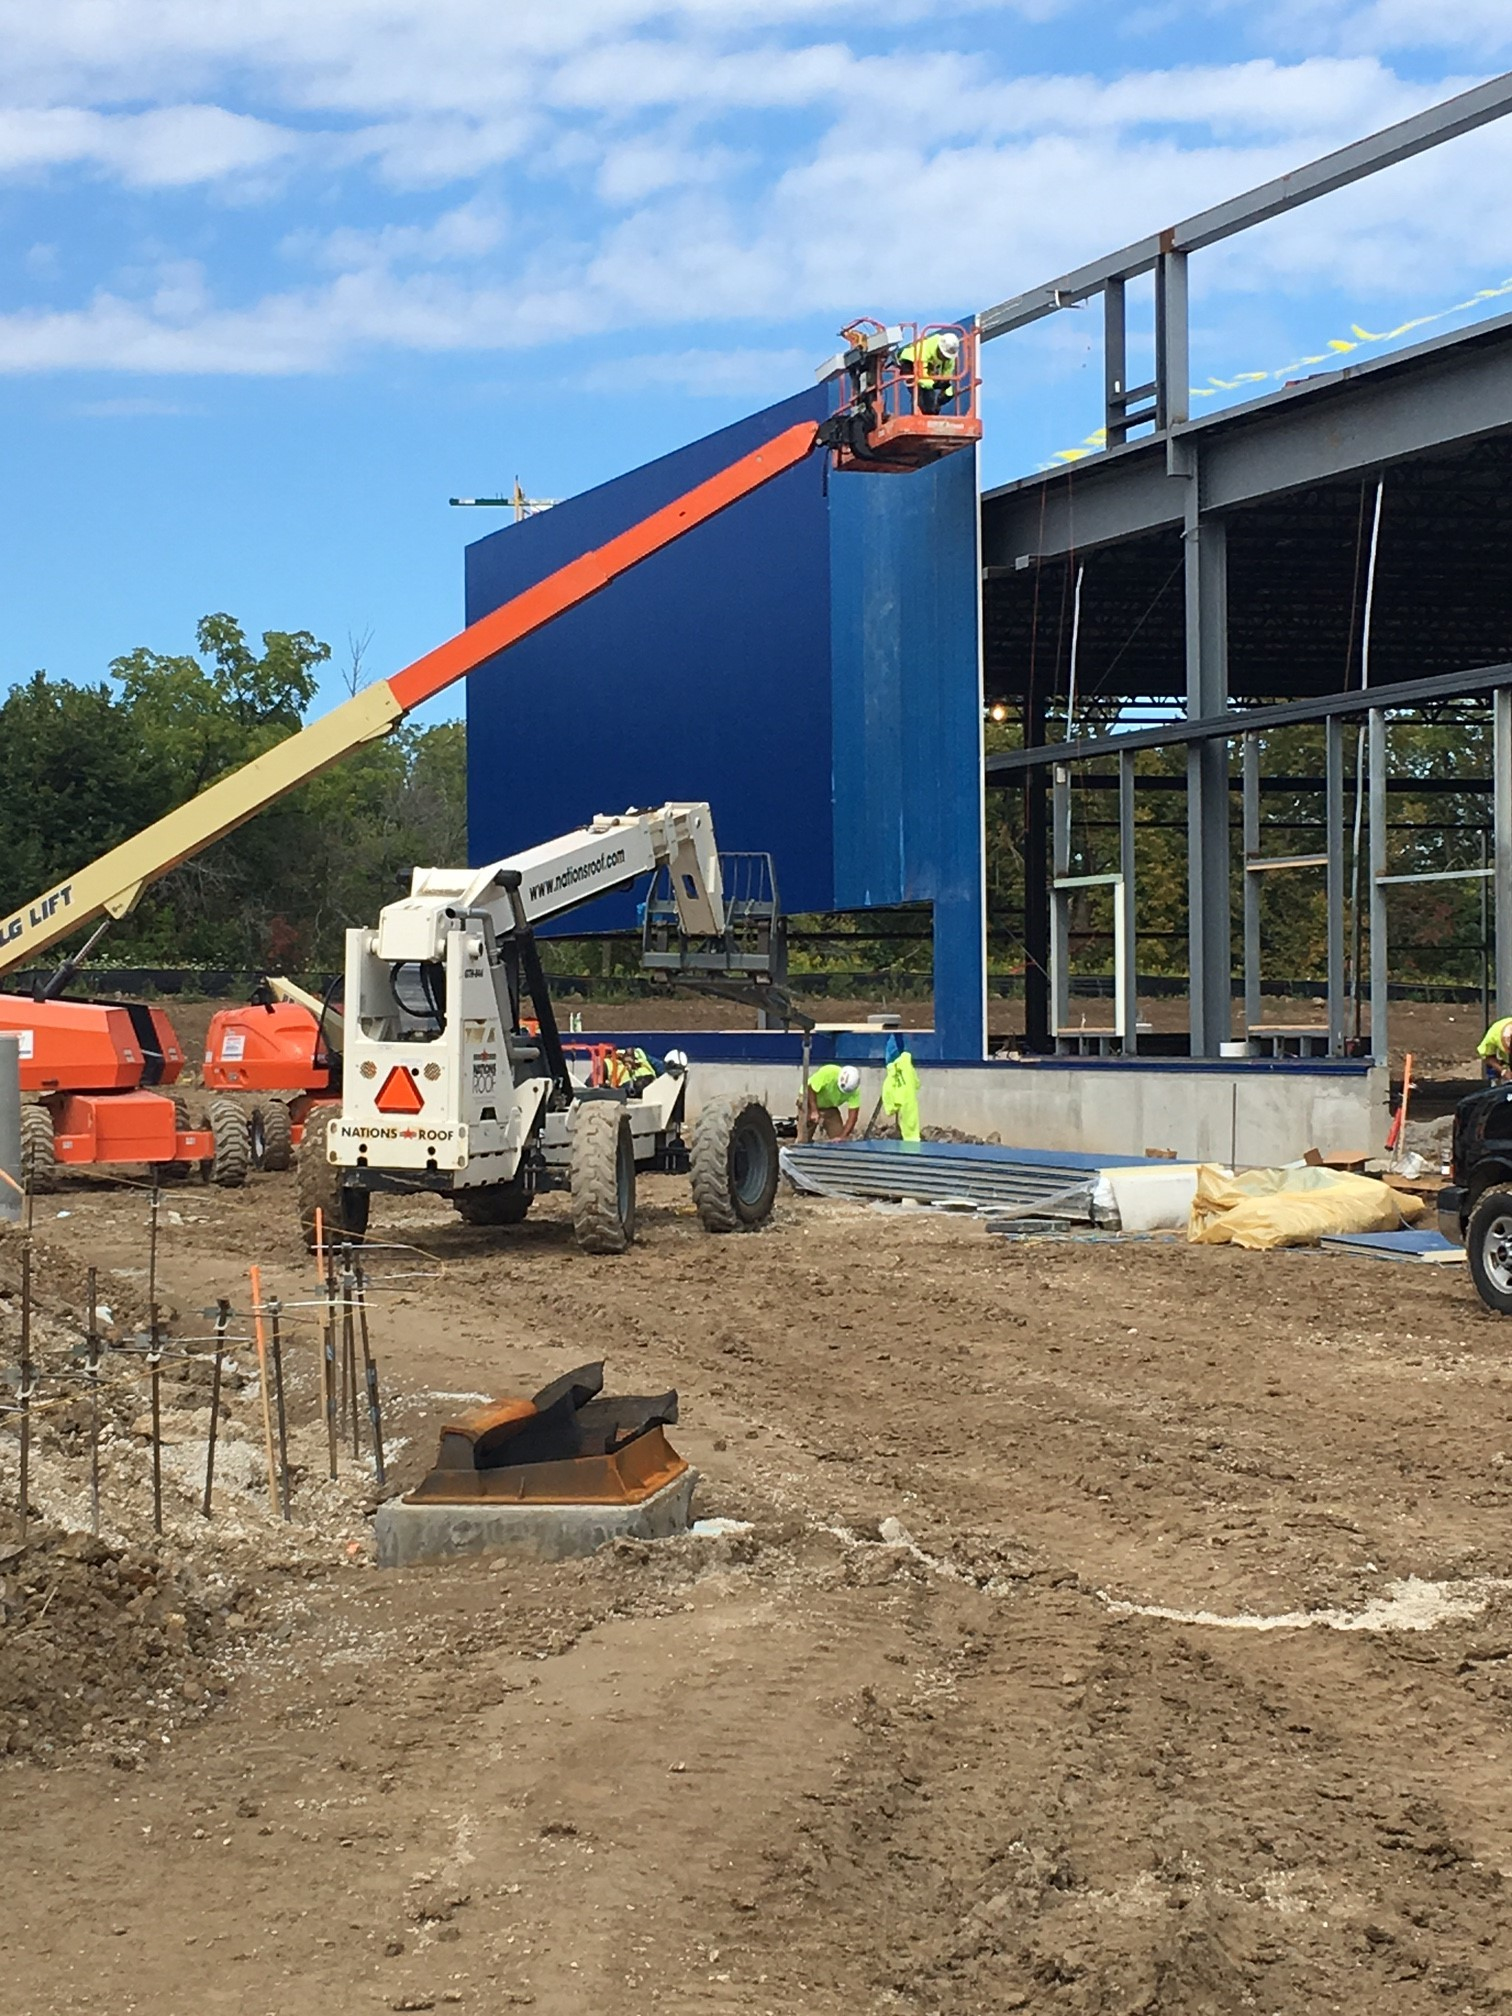 IKEA Joseph Roth  Expansion Public Affairs  610  834 0180  x 6500. Iconic Blue Exterior Transforms Future IKEA Oak Creek as Work